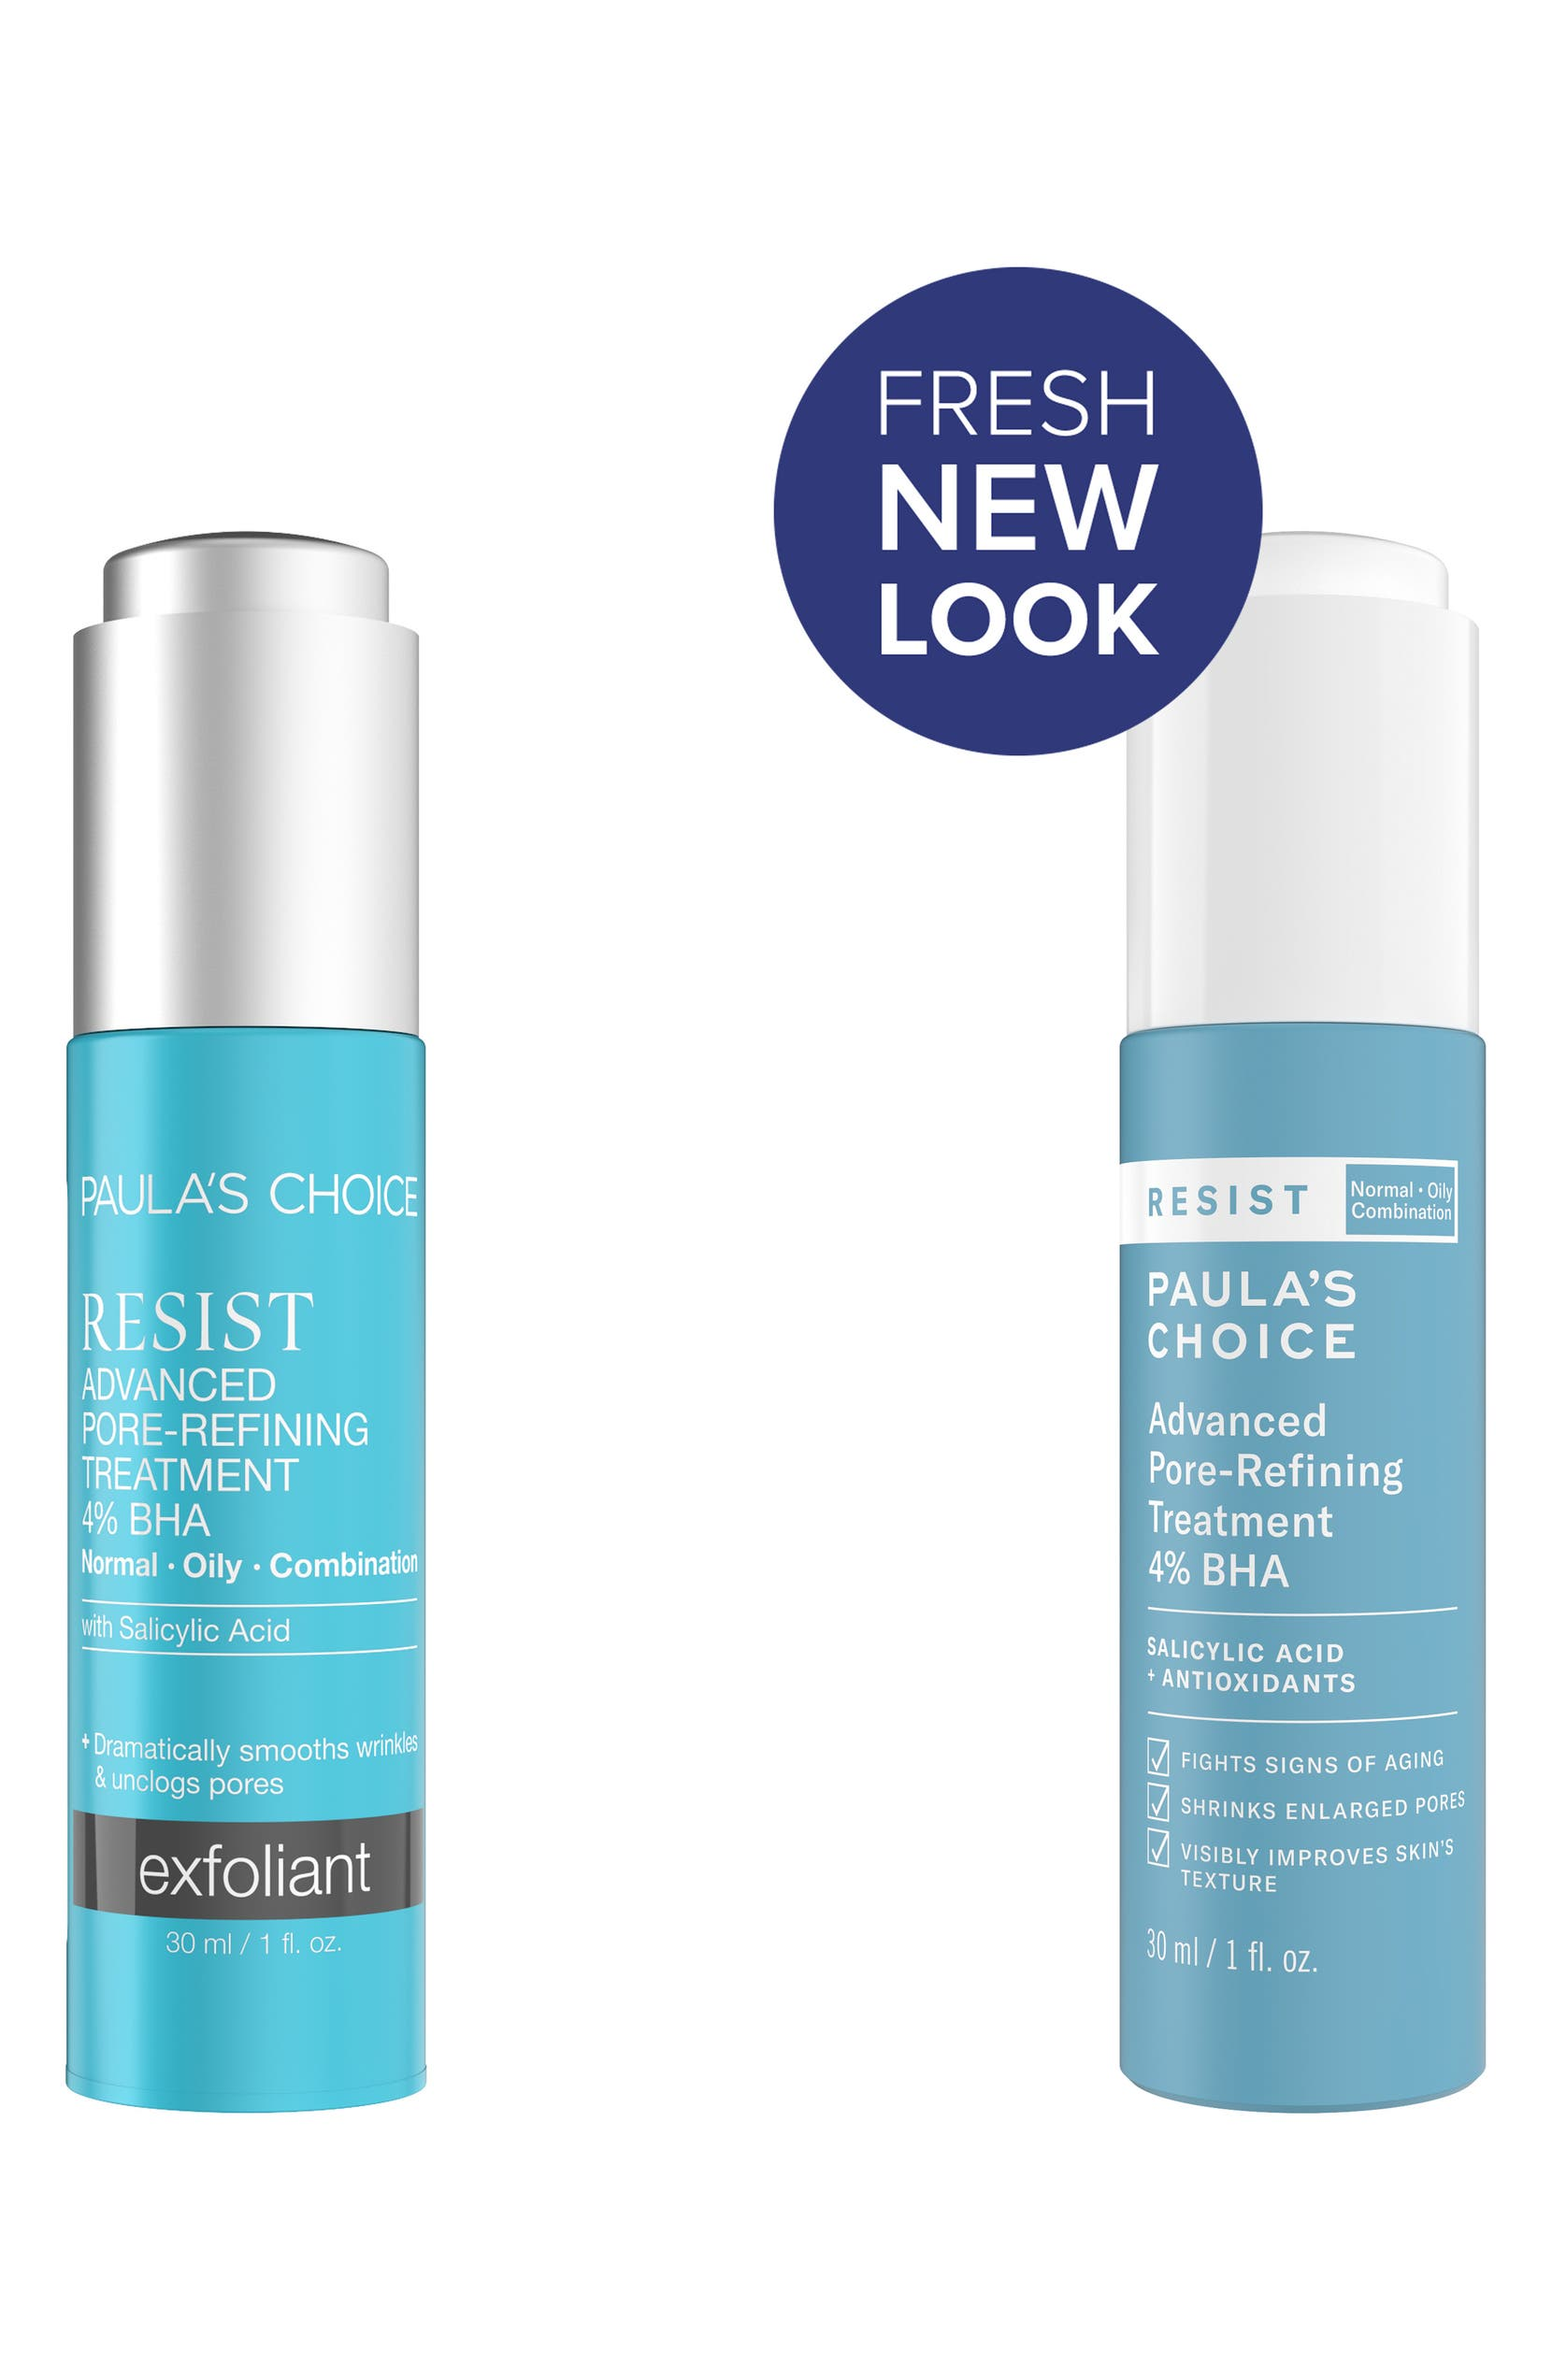 Paula's Choice Resist Advanced Pore Refining Treatment 4